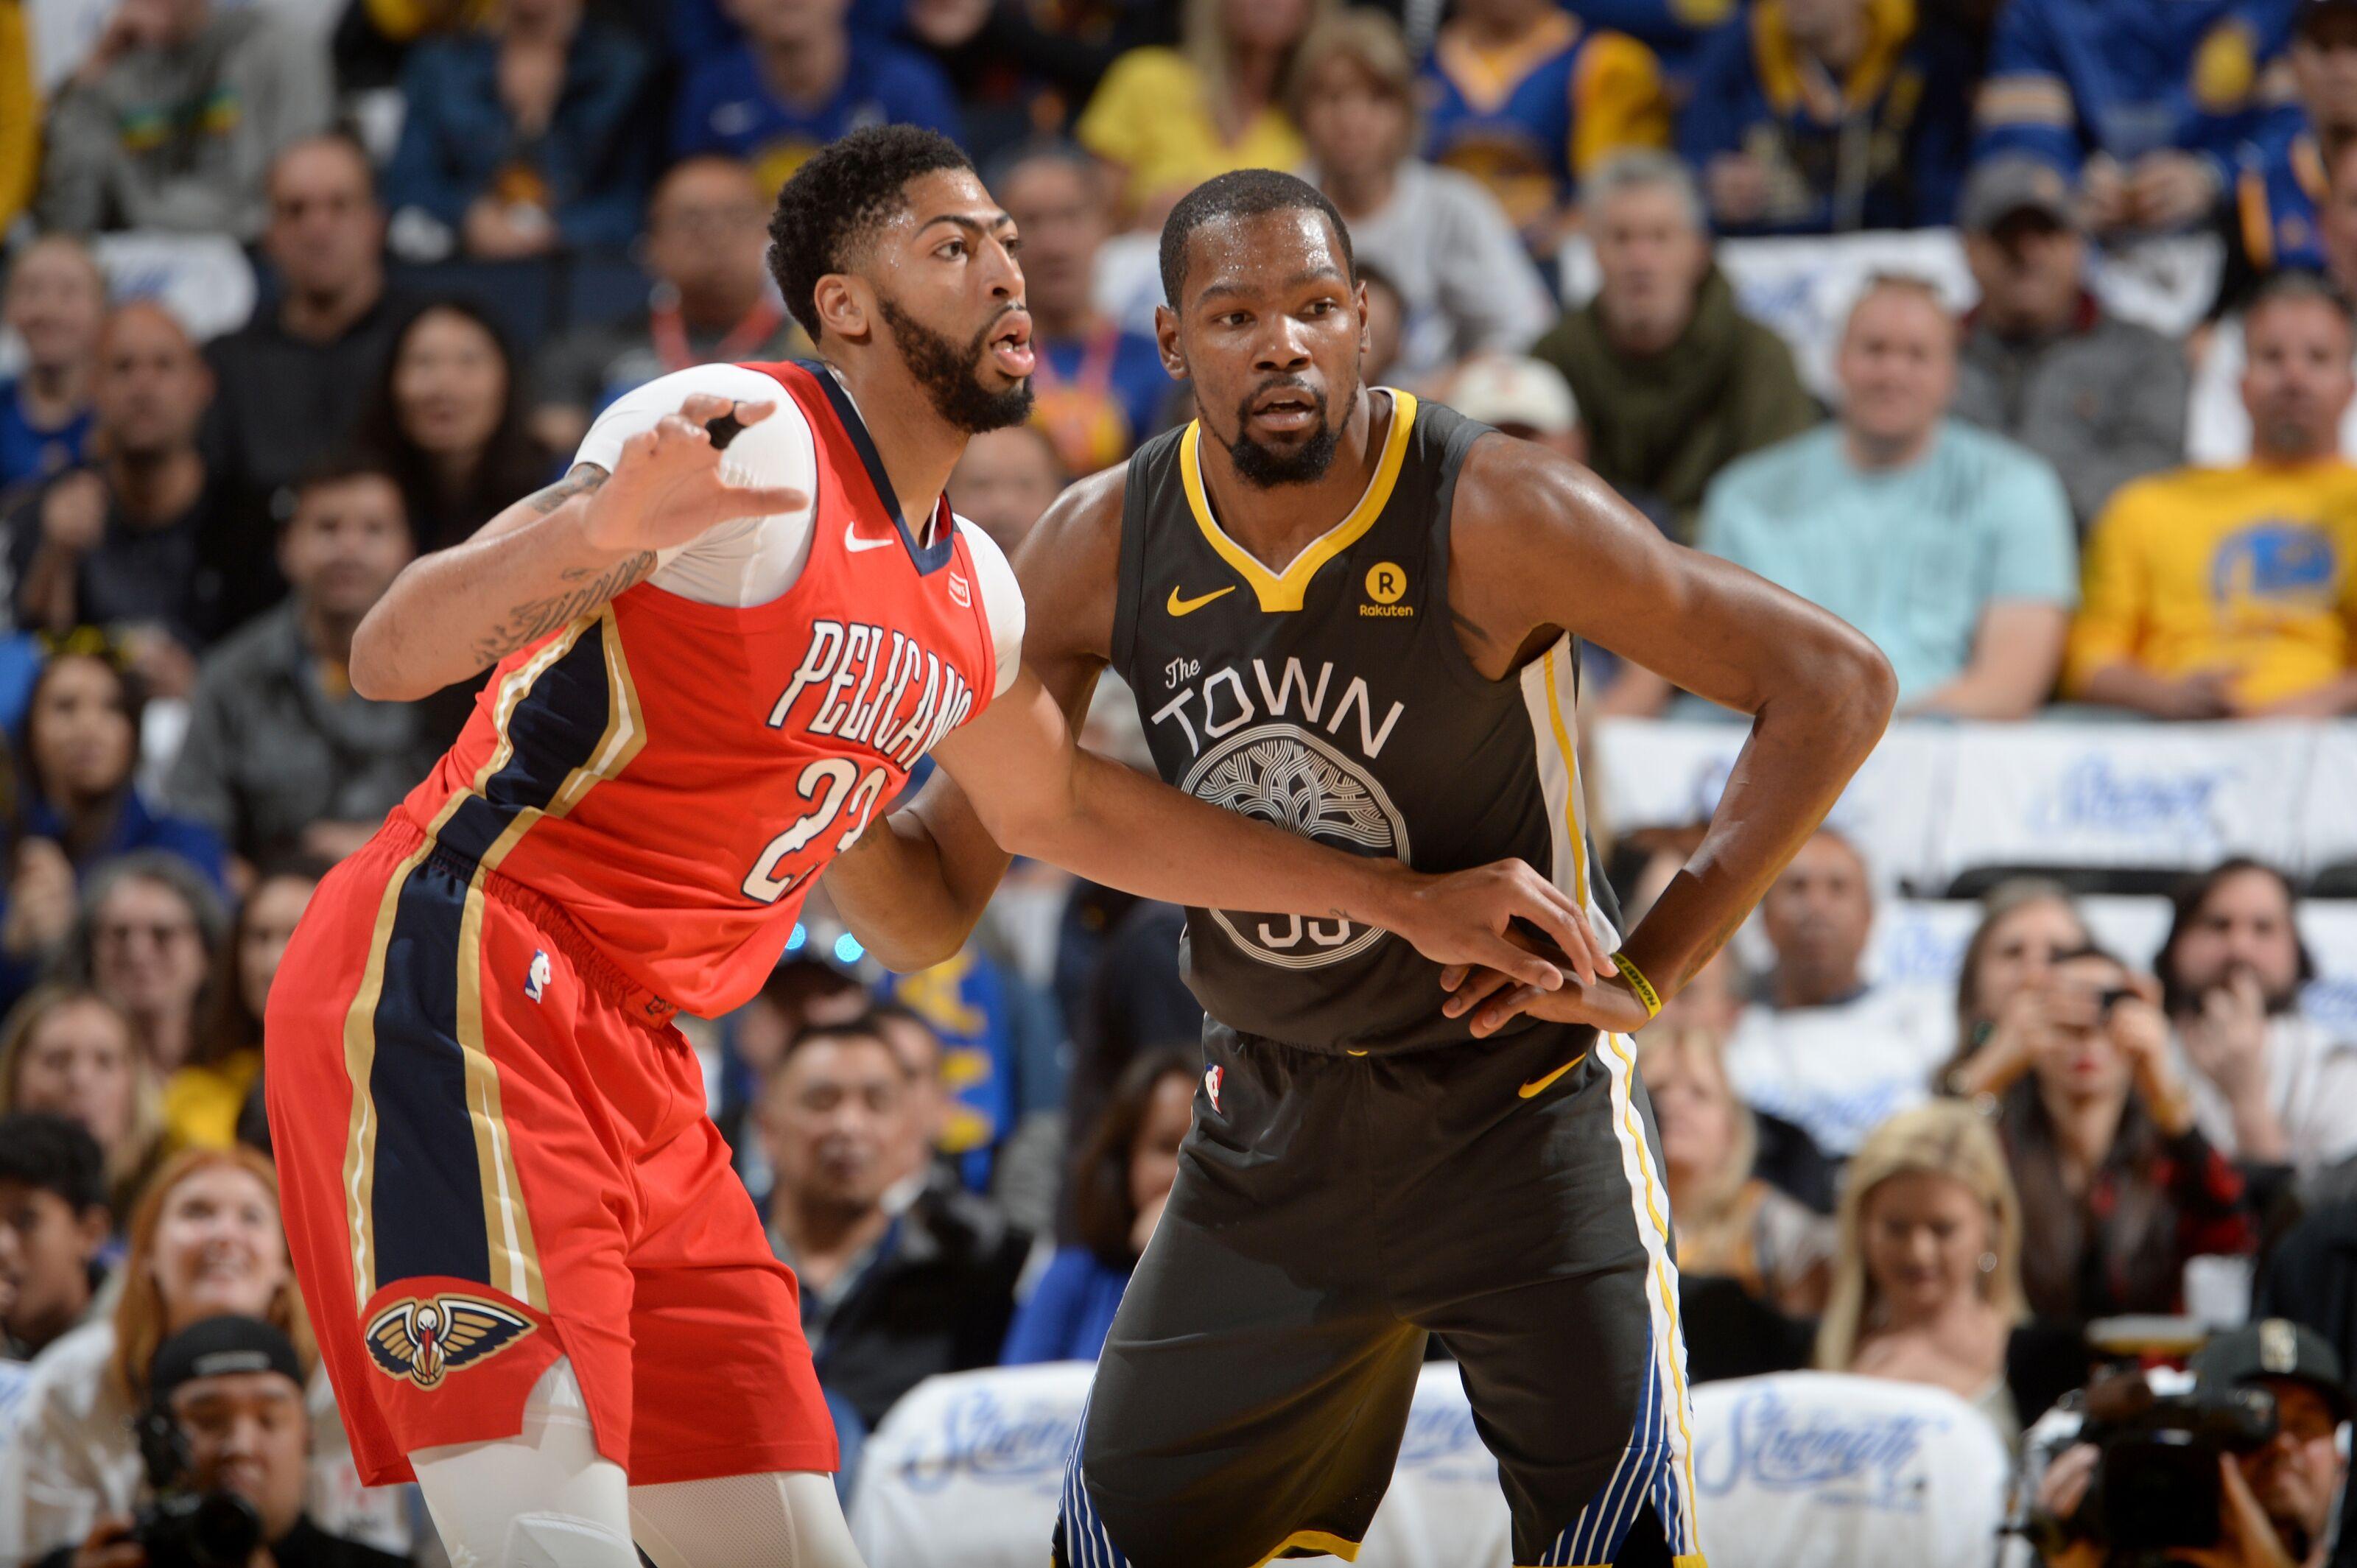 2018 NBA Playoffs: Golden State Warriors vs. Pelicans preview